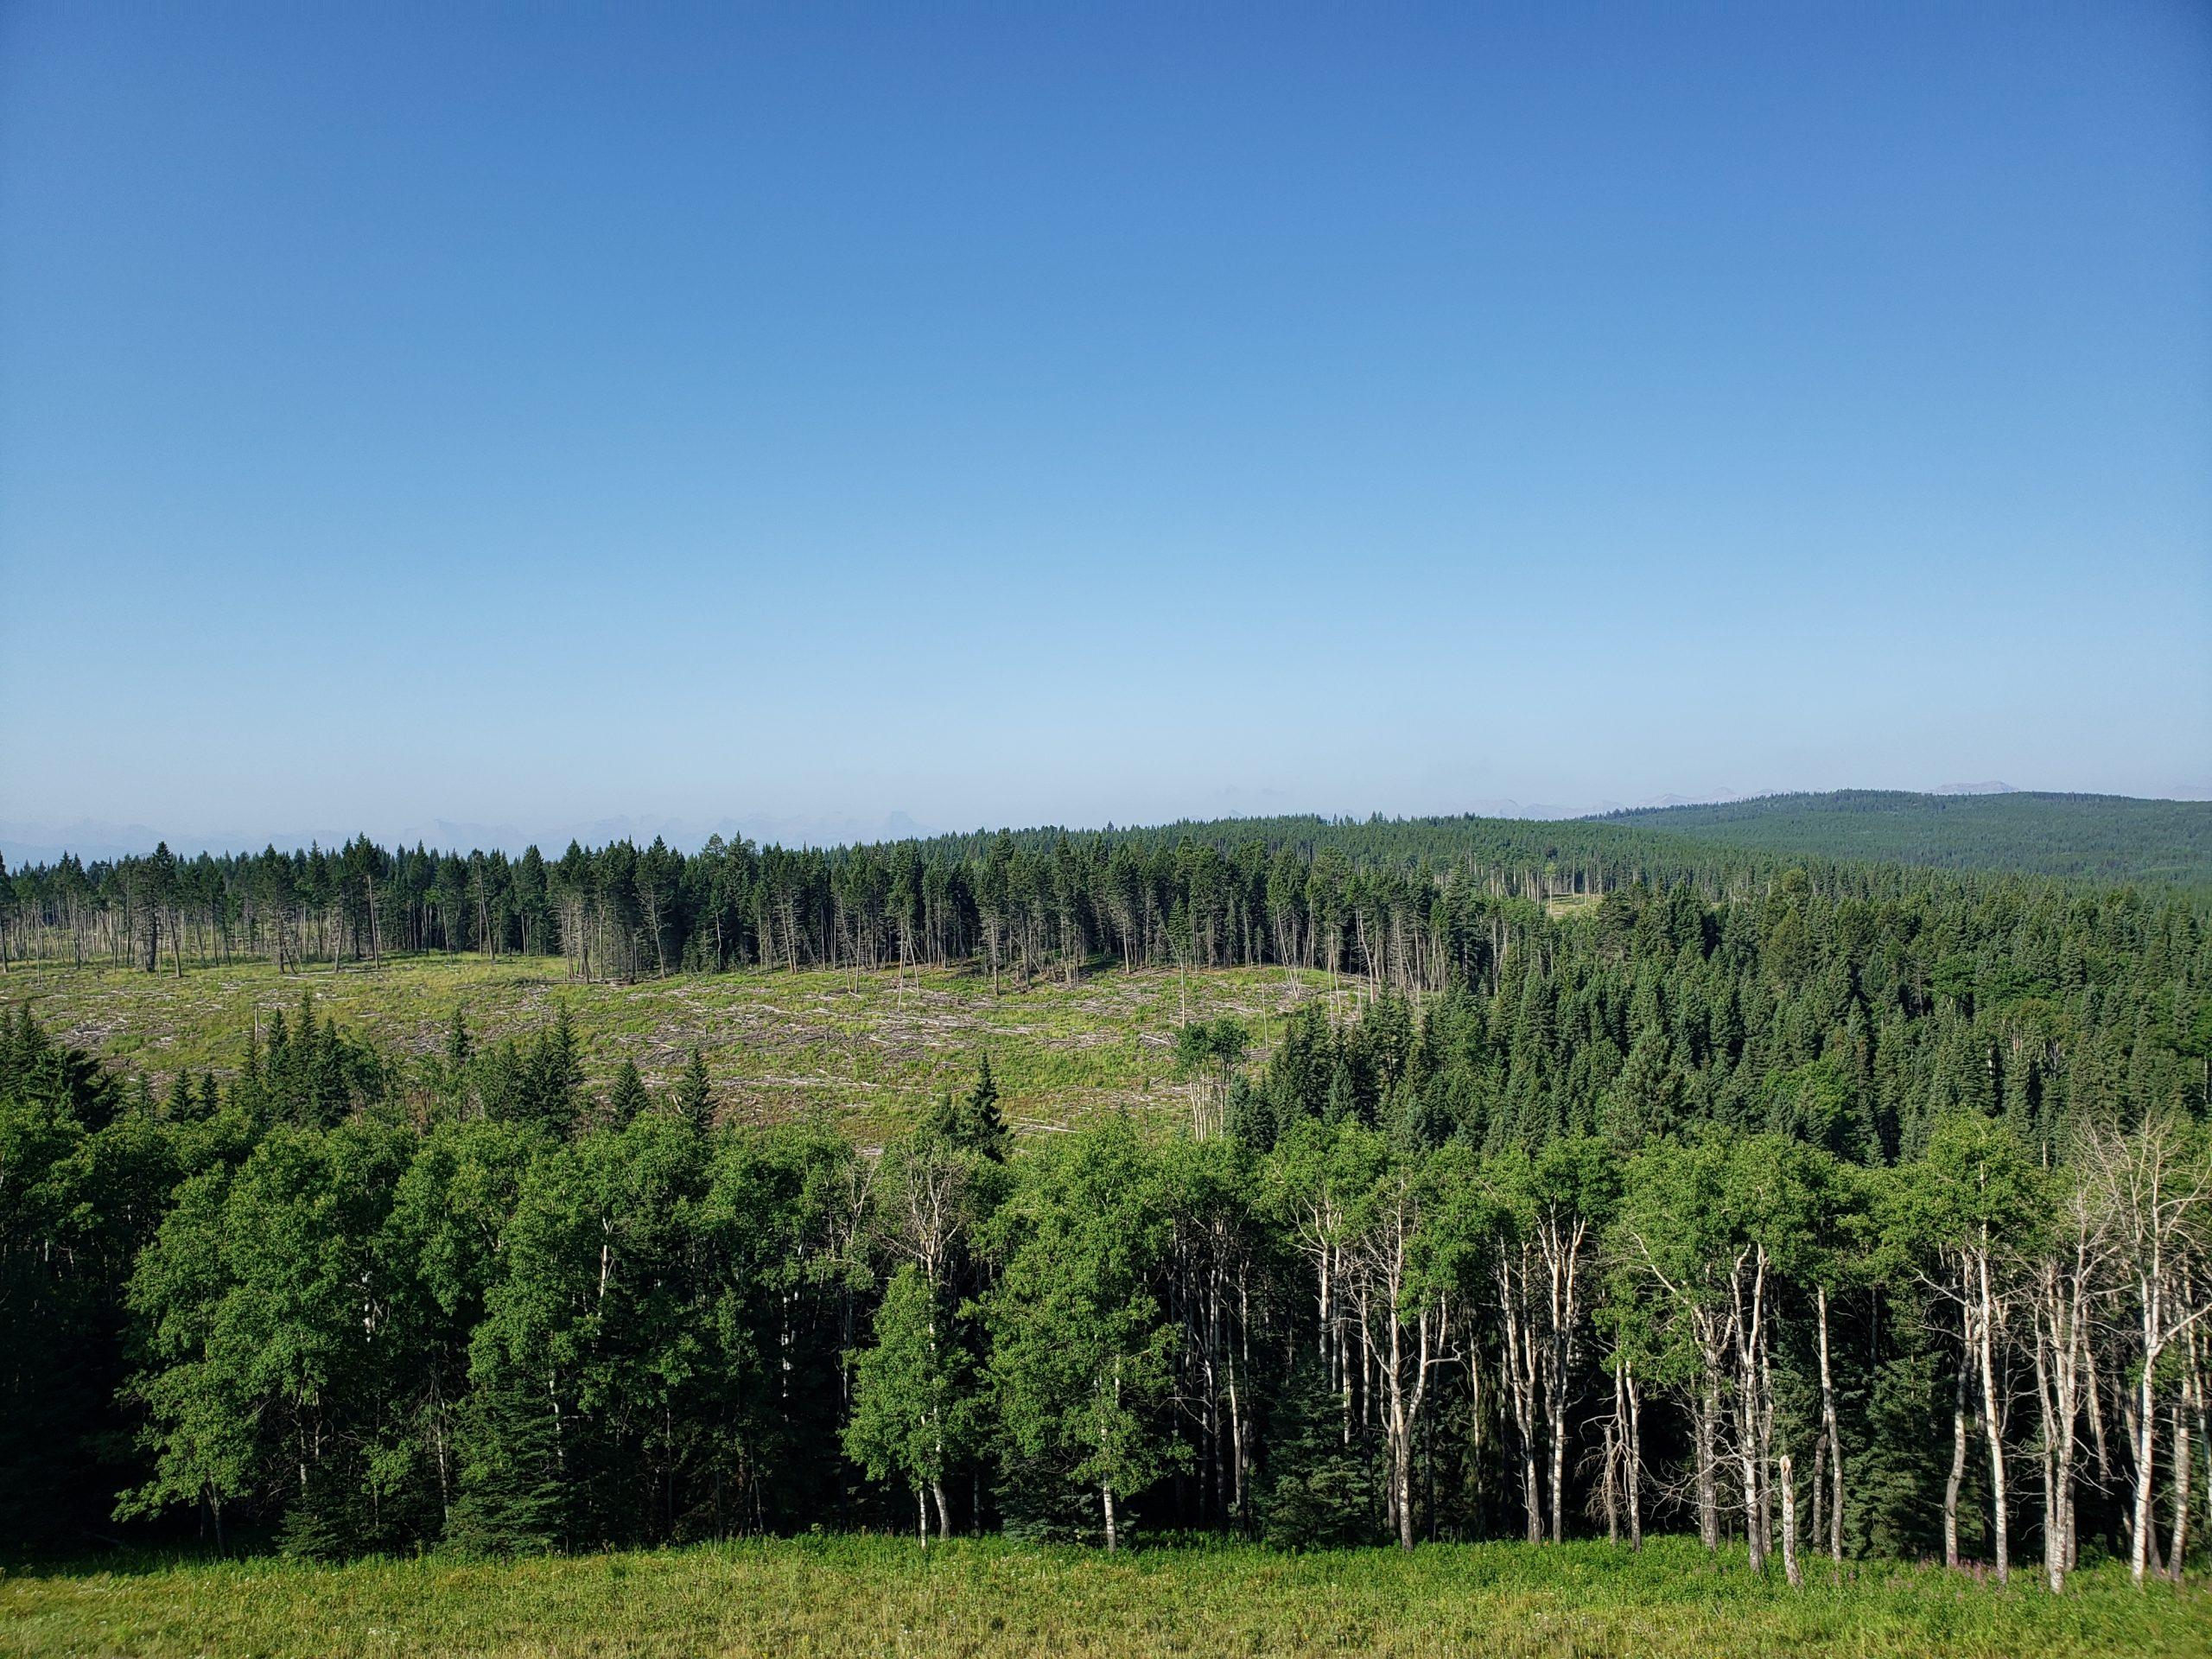 Southern Alberta's Porcupine Hills